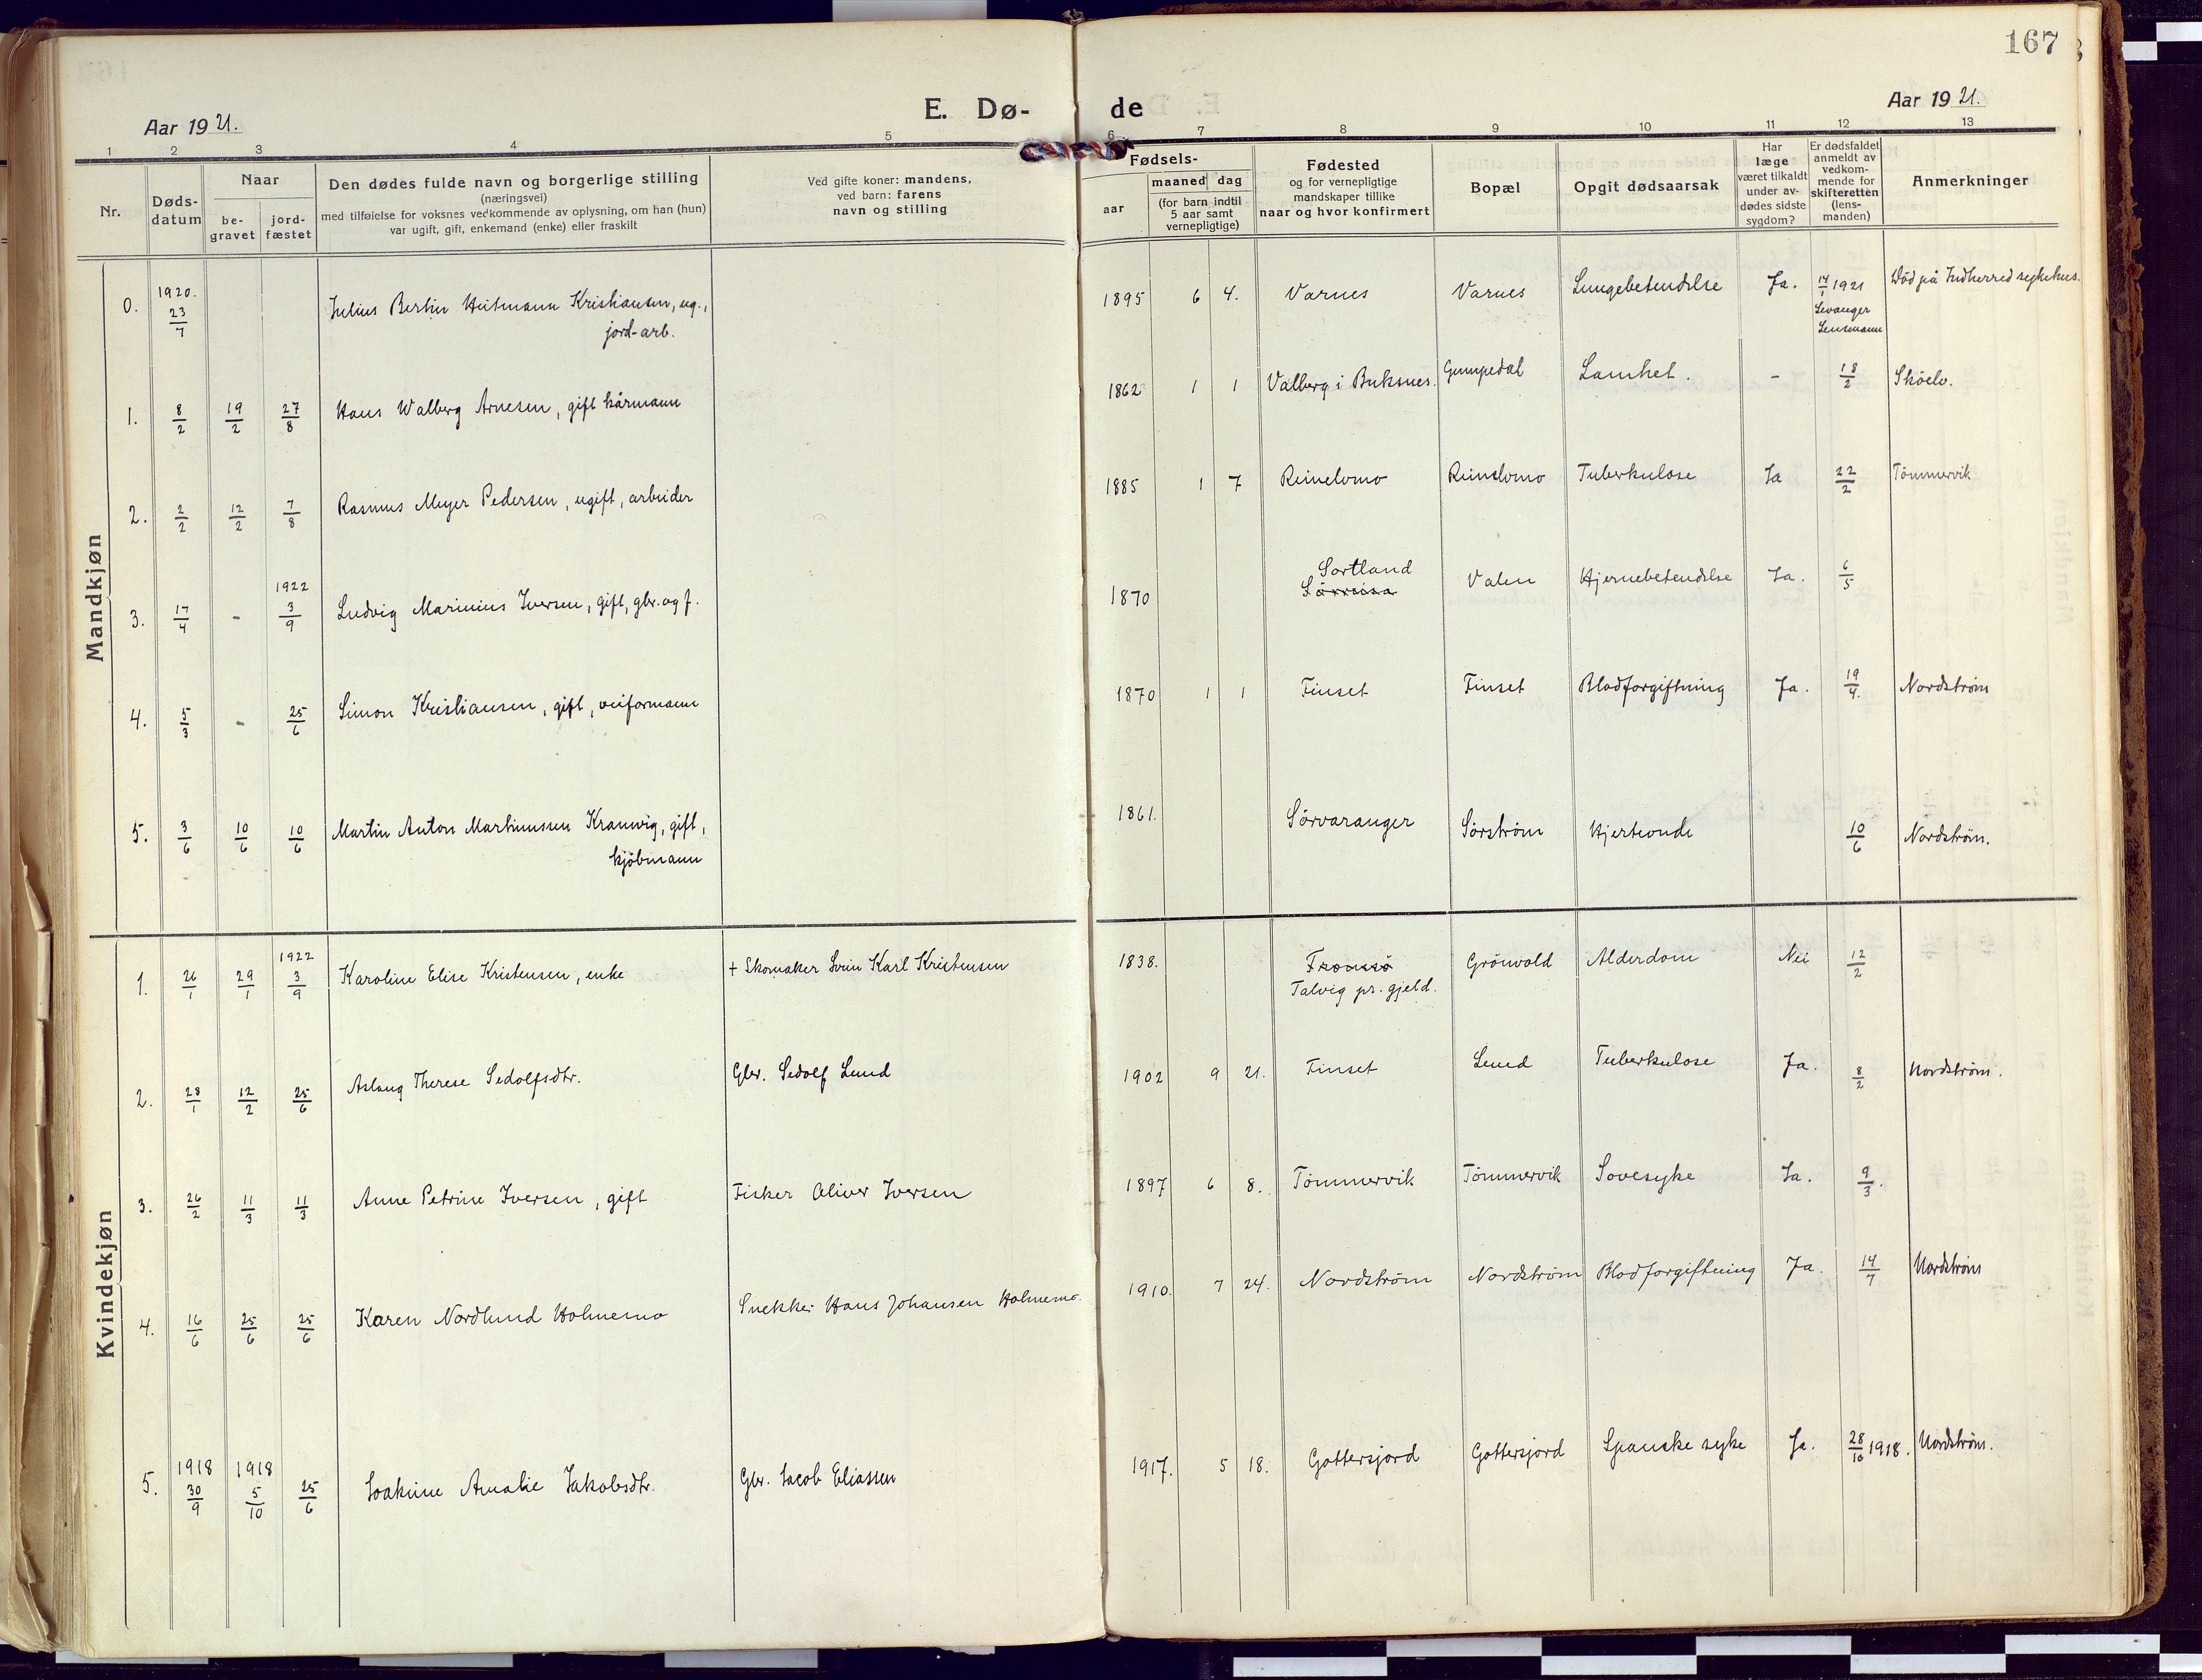 SATØ, Tranøy sokneprestkontor, I/Ia/Iaa/L0015kirke: Ministerialbok nr. 15, 1919-1928, s. 167